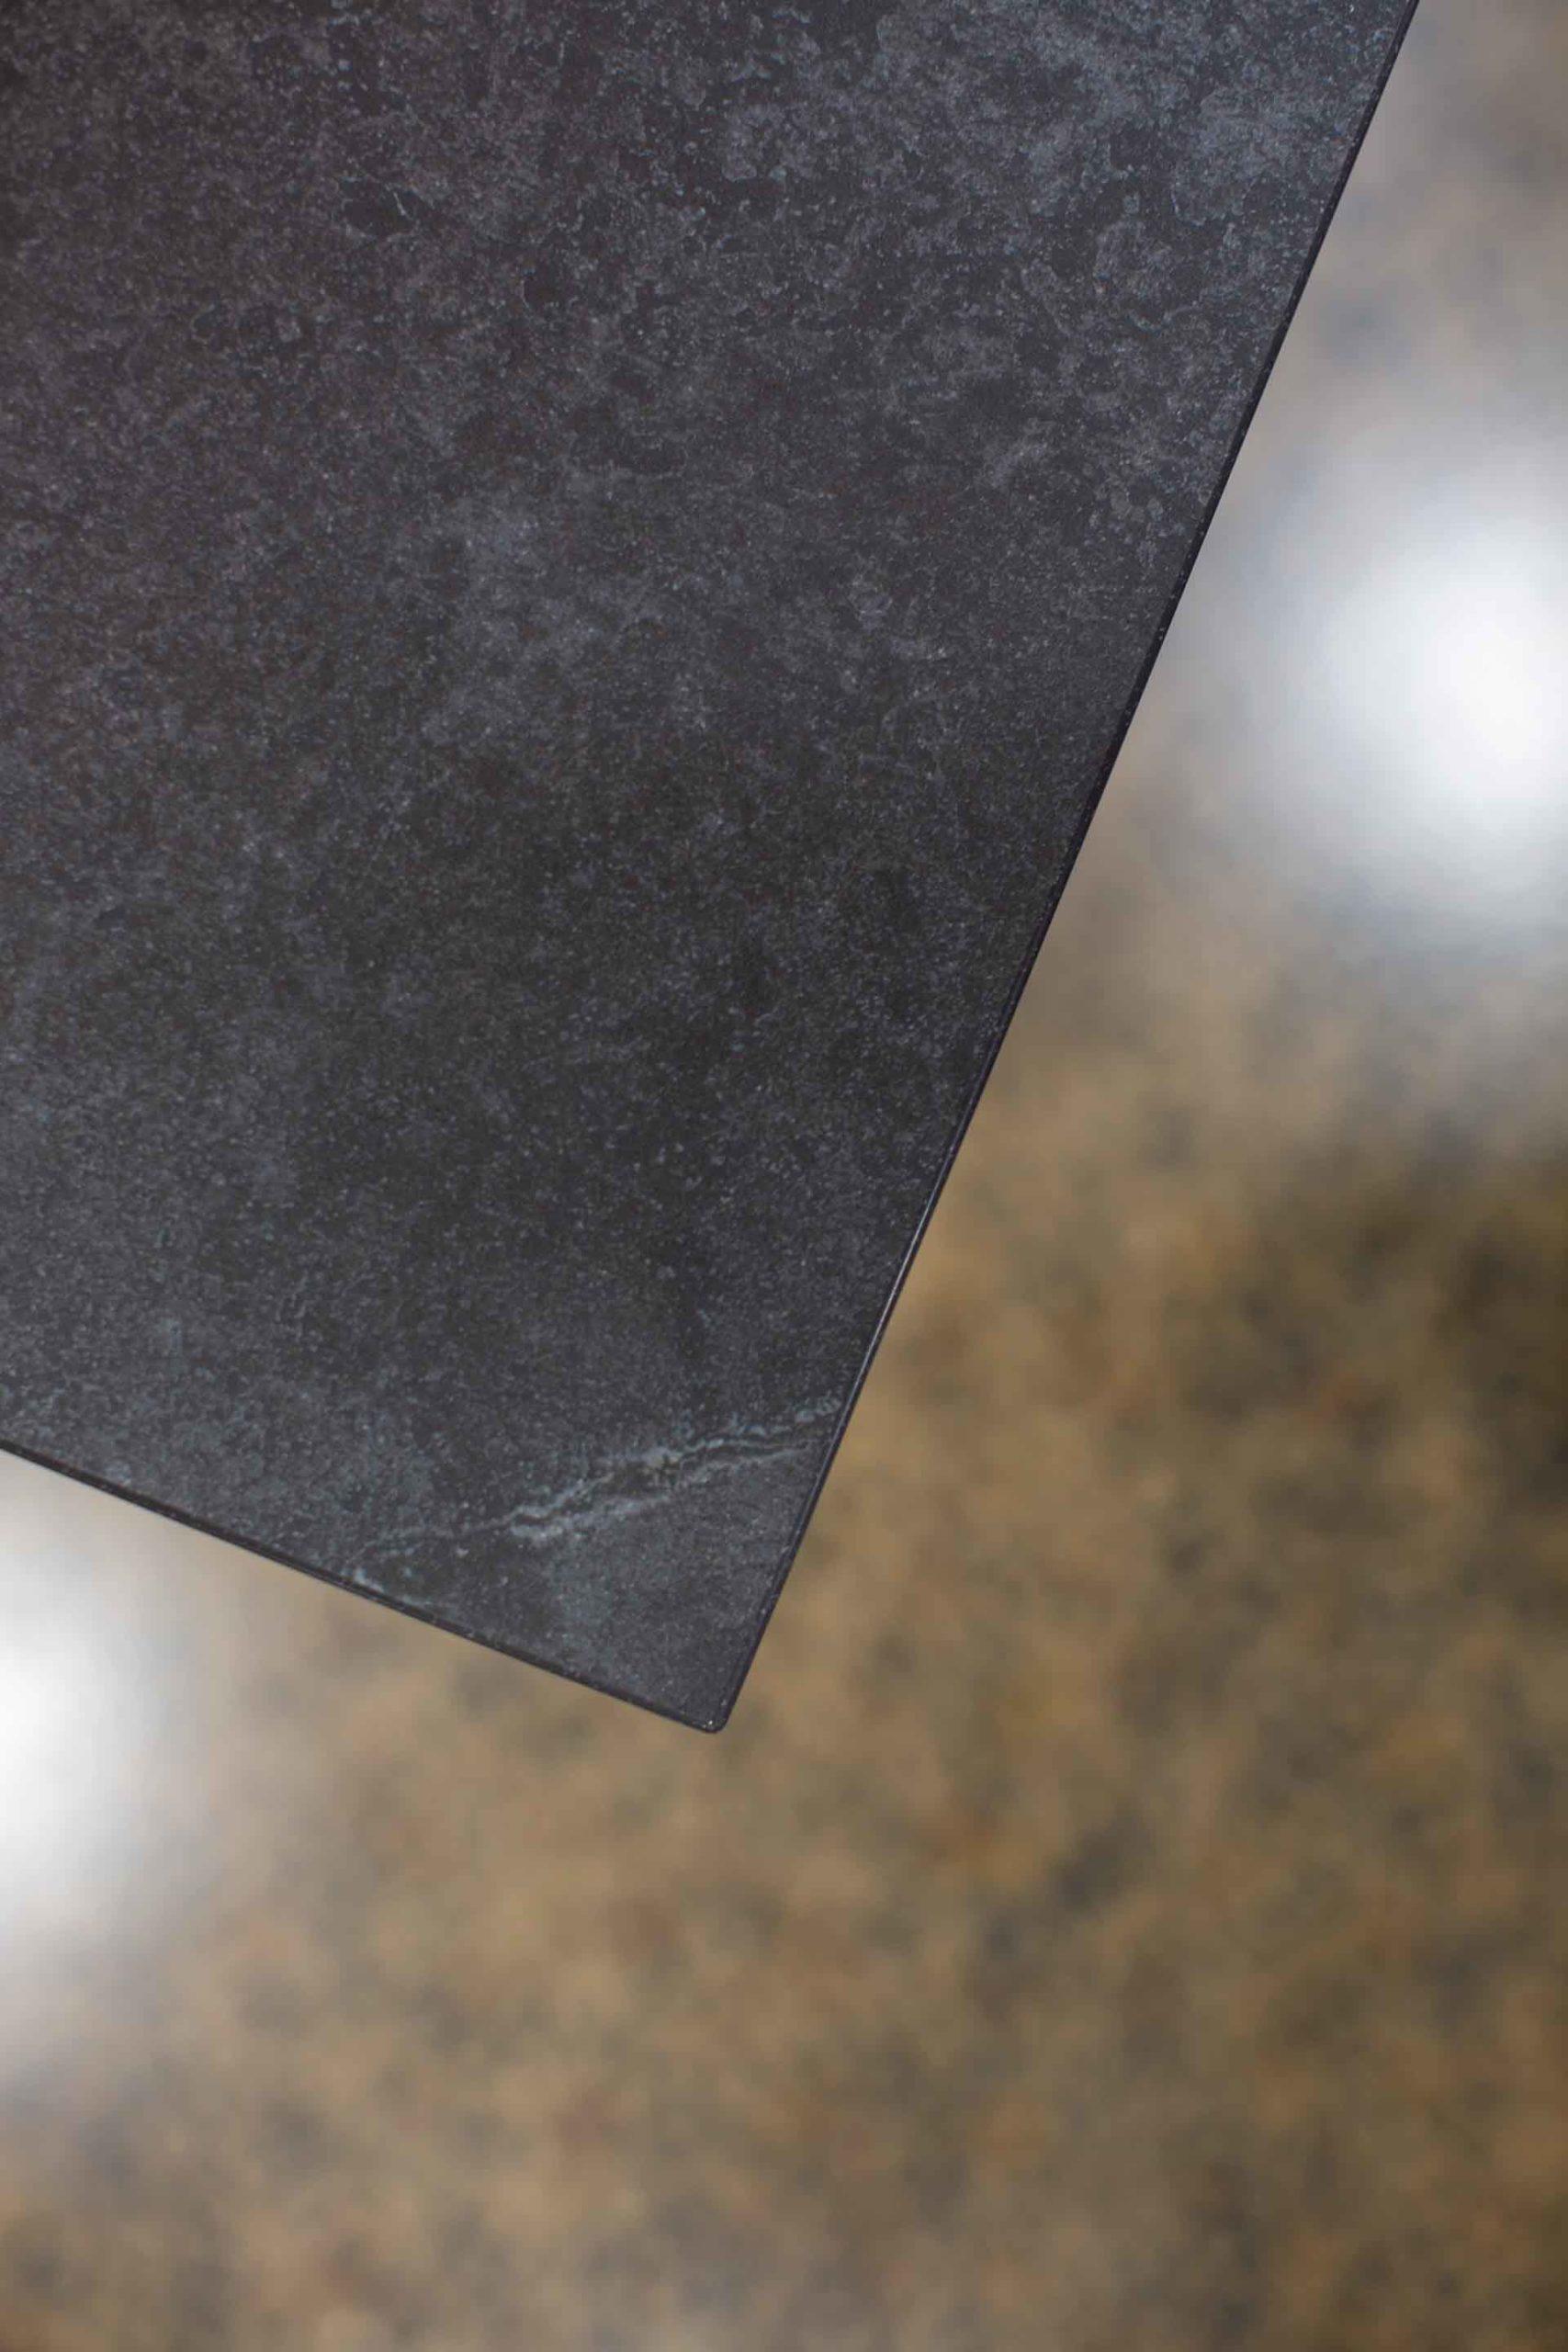 Leopard_Lens_Photography_Inarc_Design_Simson_Kitchen_Showroom-48